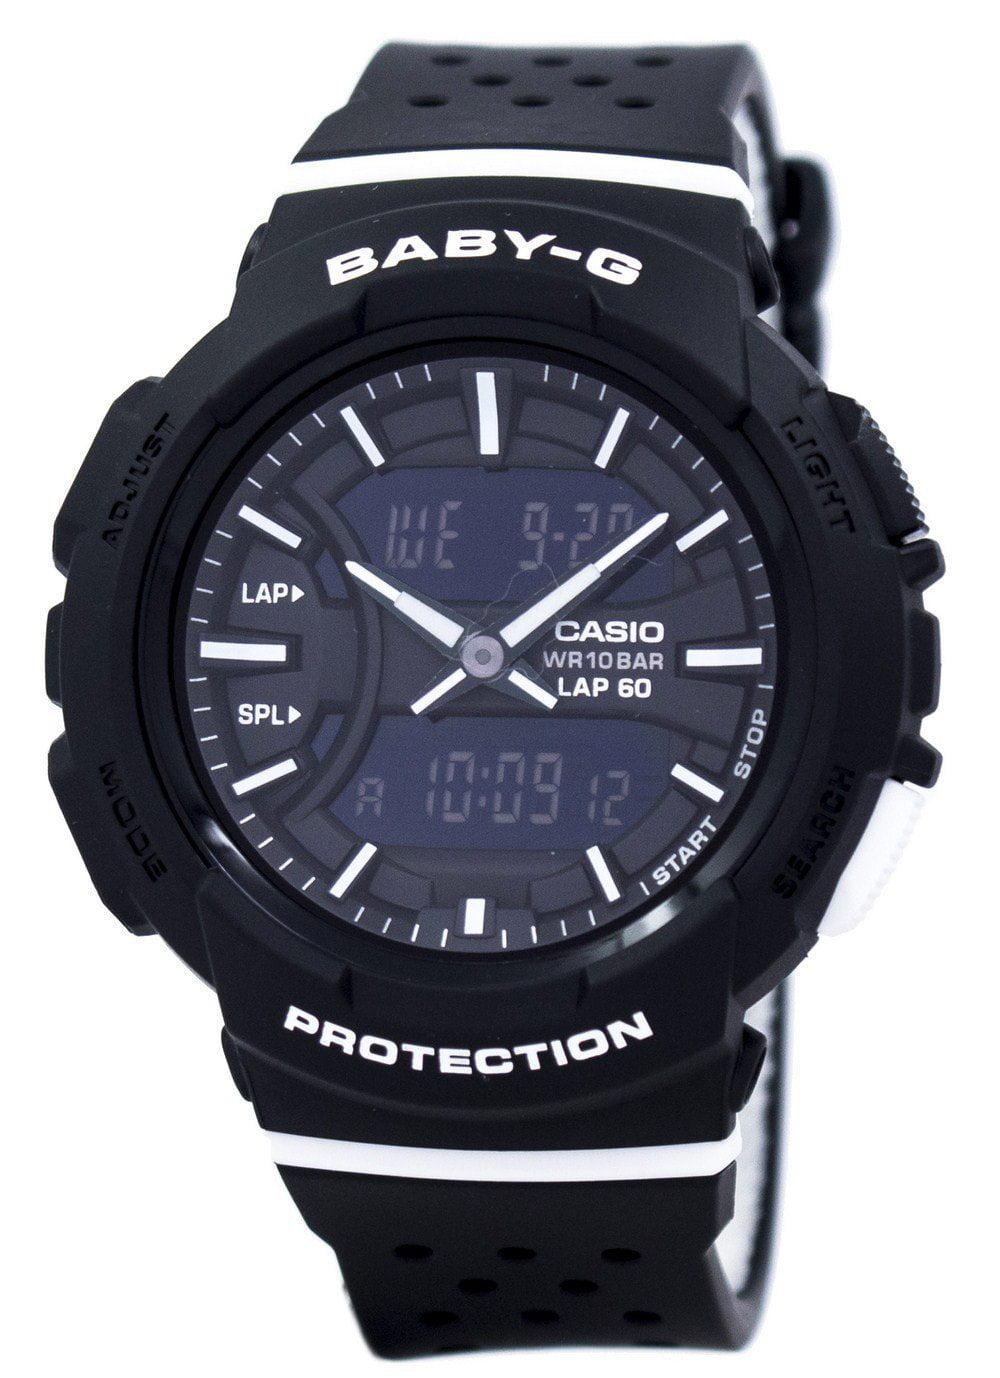 Casio Baby-G Shock Resistant Dual Time Analog Digital BGA-240-1A1 Womens Watch